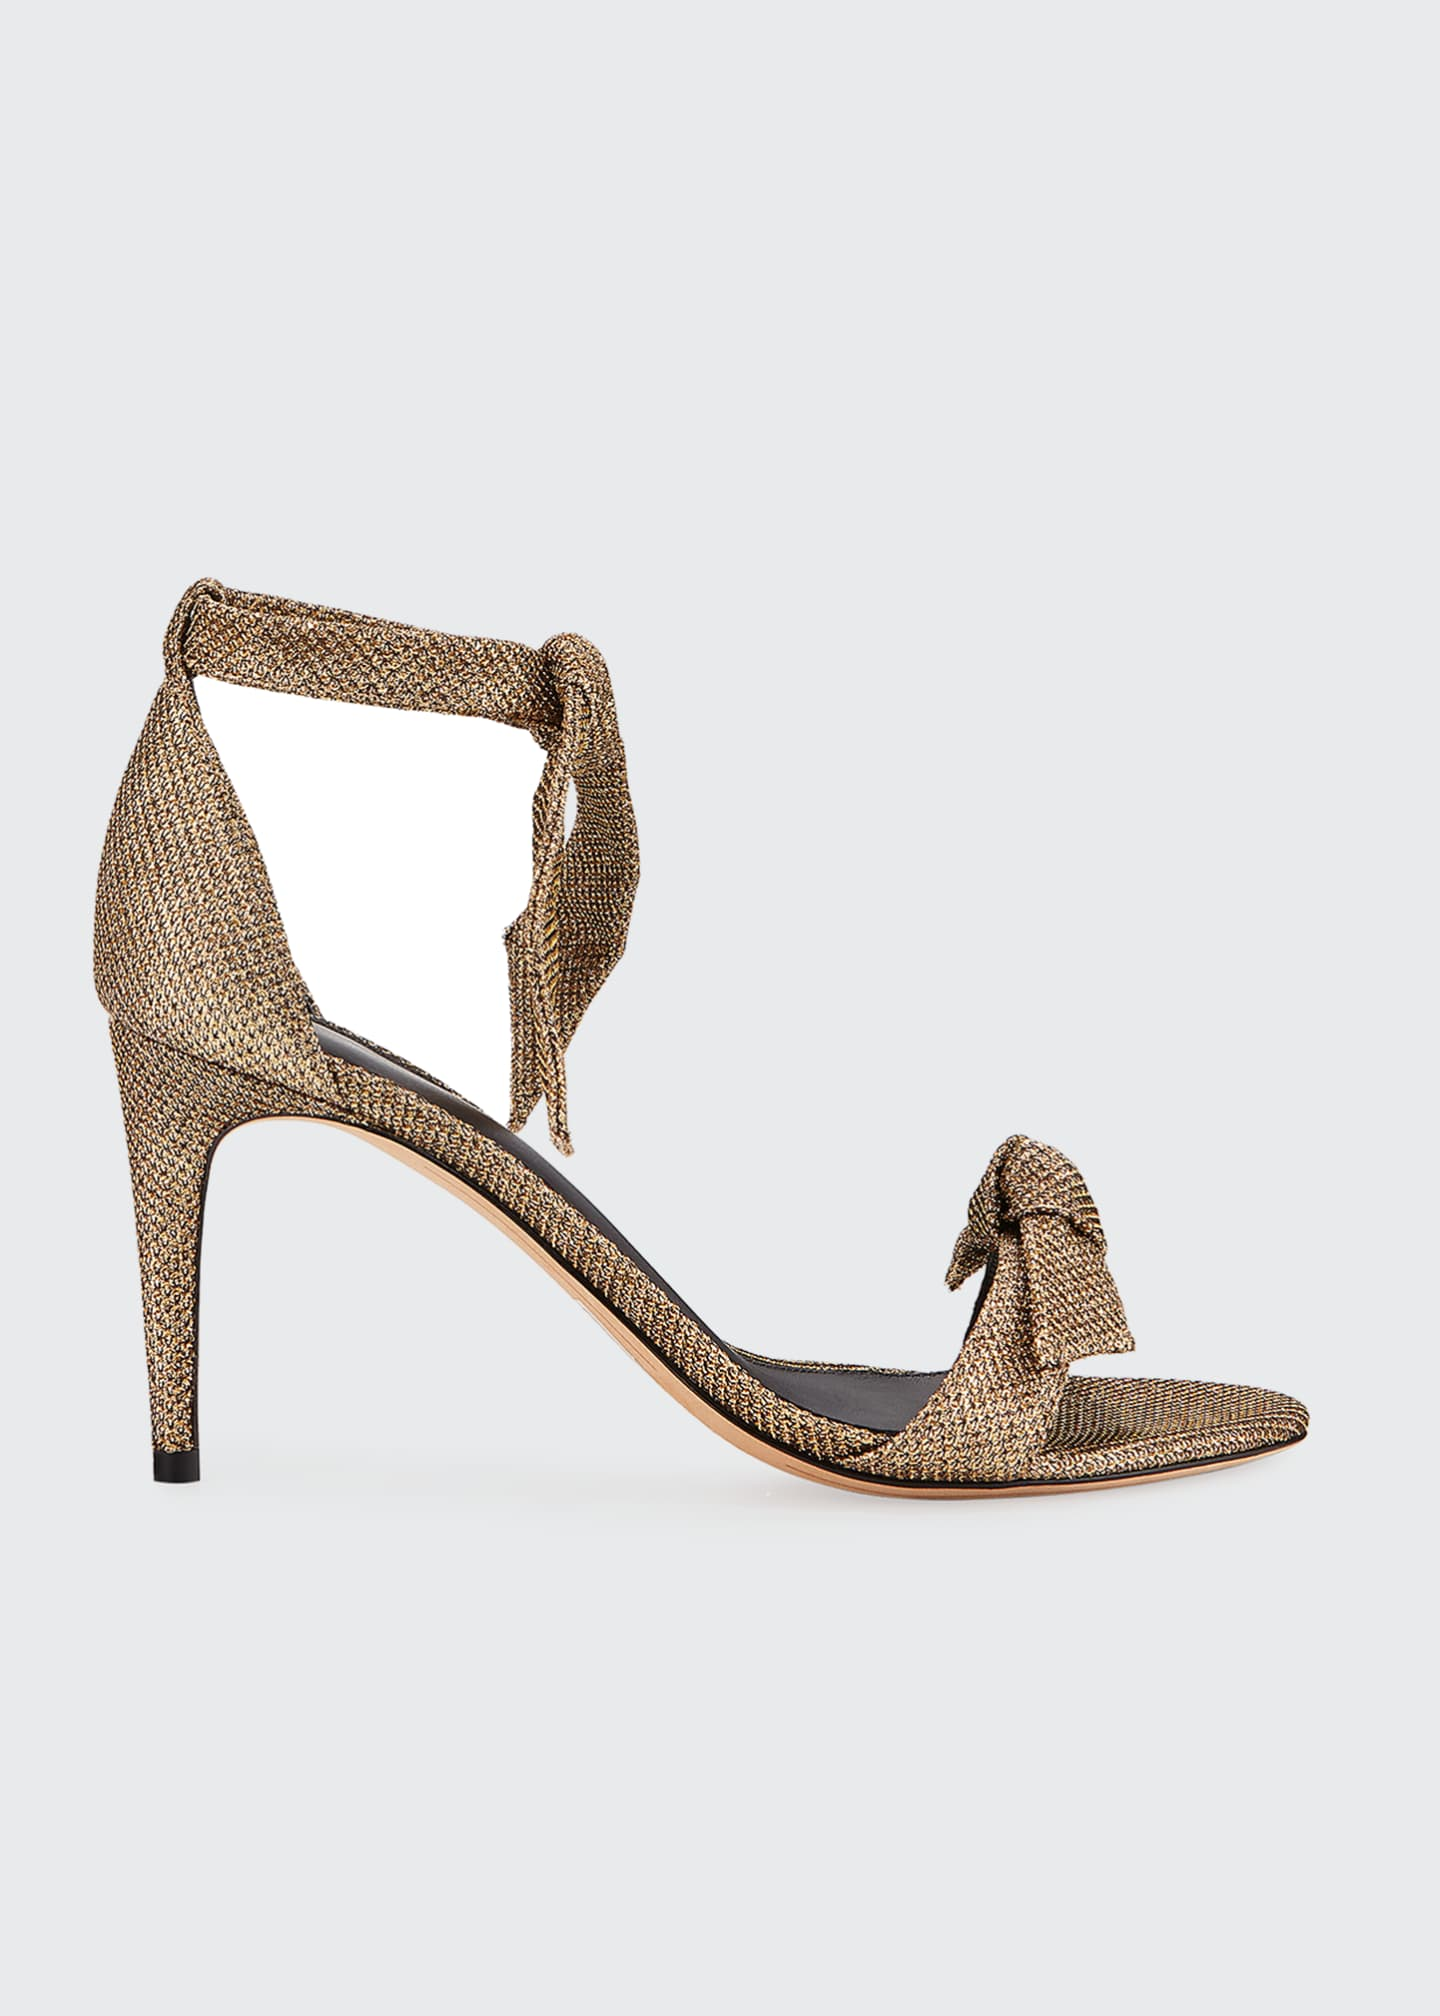 Alexandre Birman Clarita Glittered Mesh Ankle-Tie Sandals